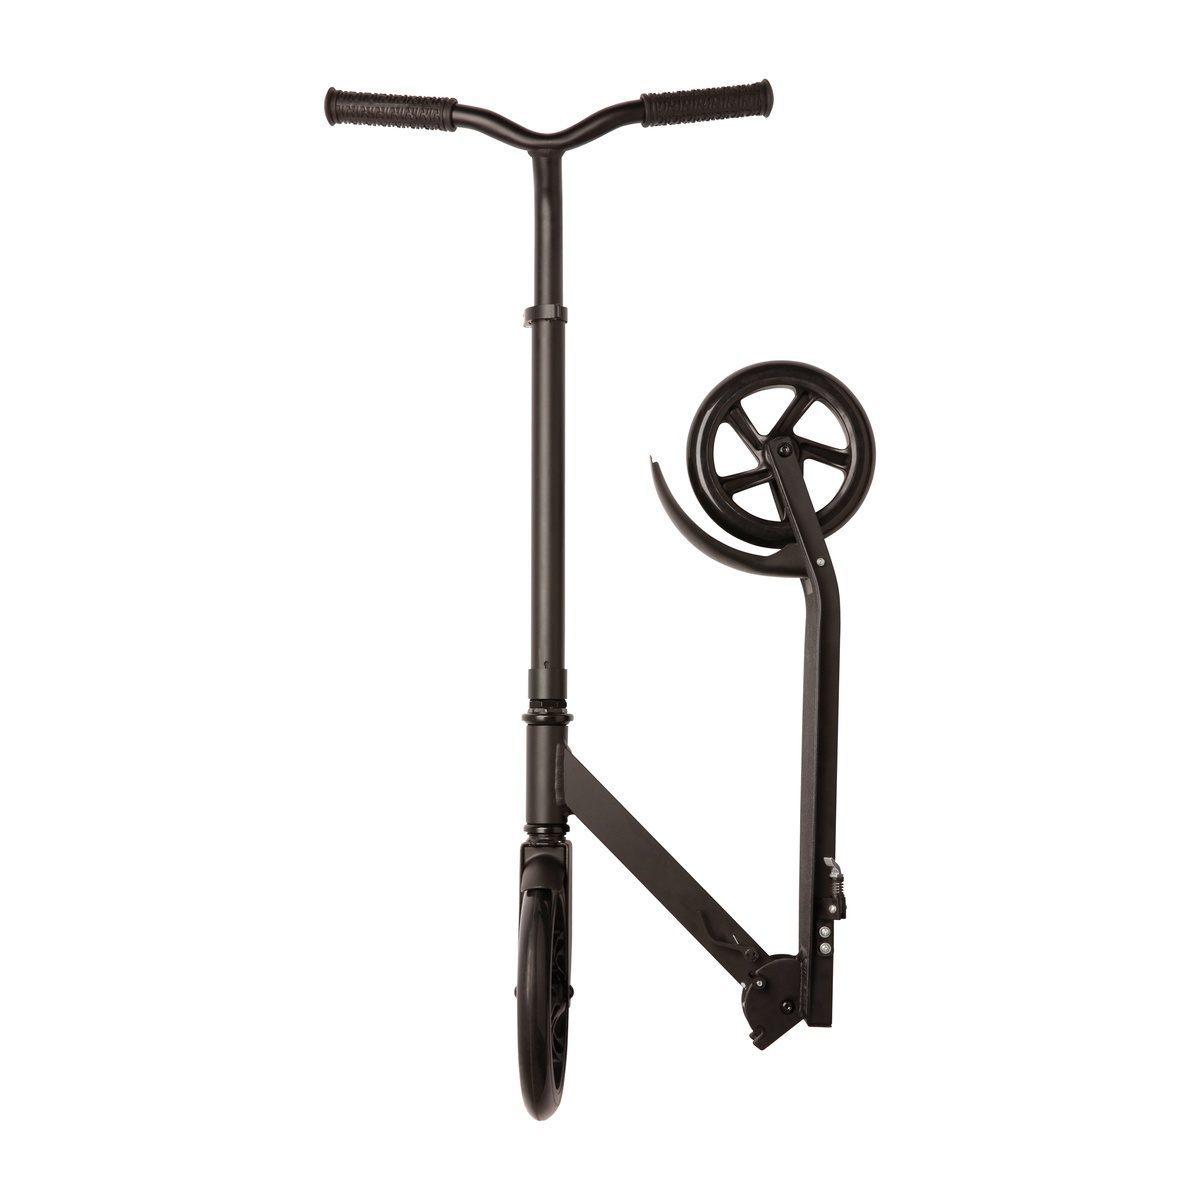 fun scooter roller tretroller bis 100 kg belastbar schwarz aluminium reflects ebay. Black Bedroom Furniture Sets. Home Design Ideas